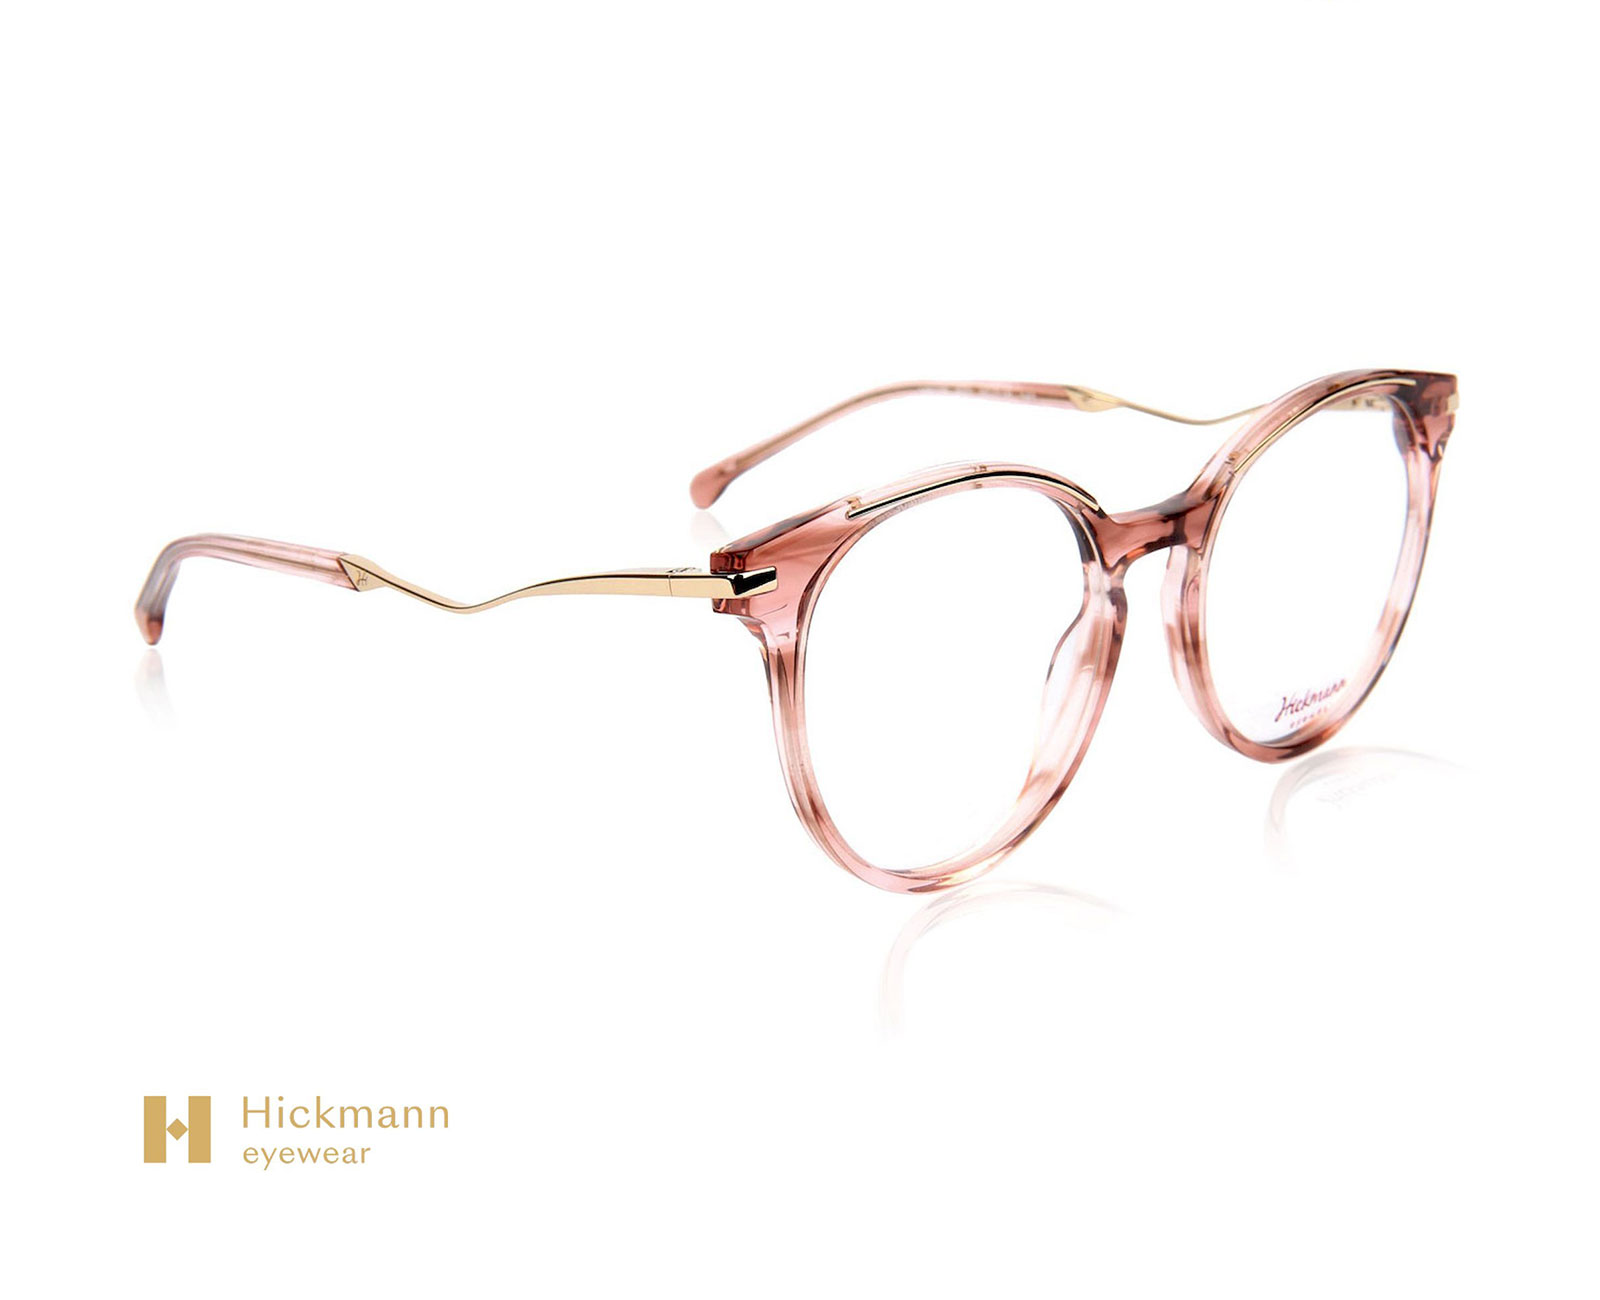 Hickmann Eyewear HI6139 in Pink Red Stripe